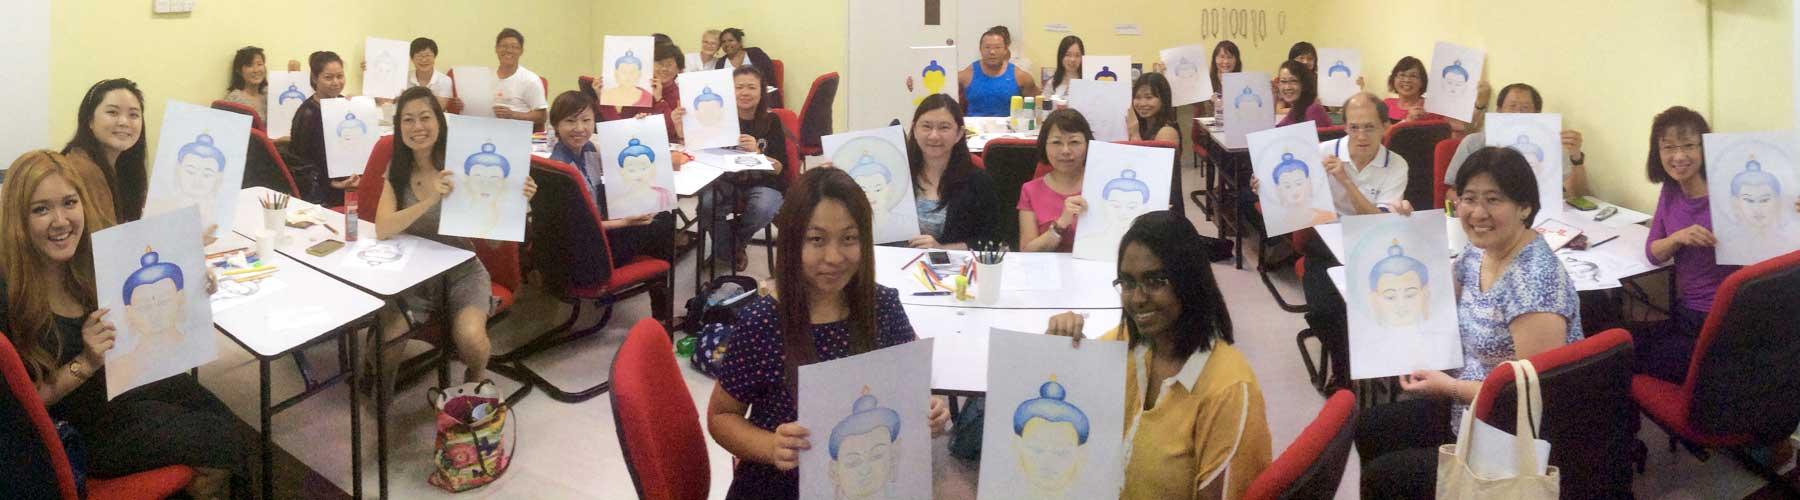 buddha-face-class-singapore